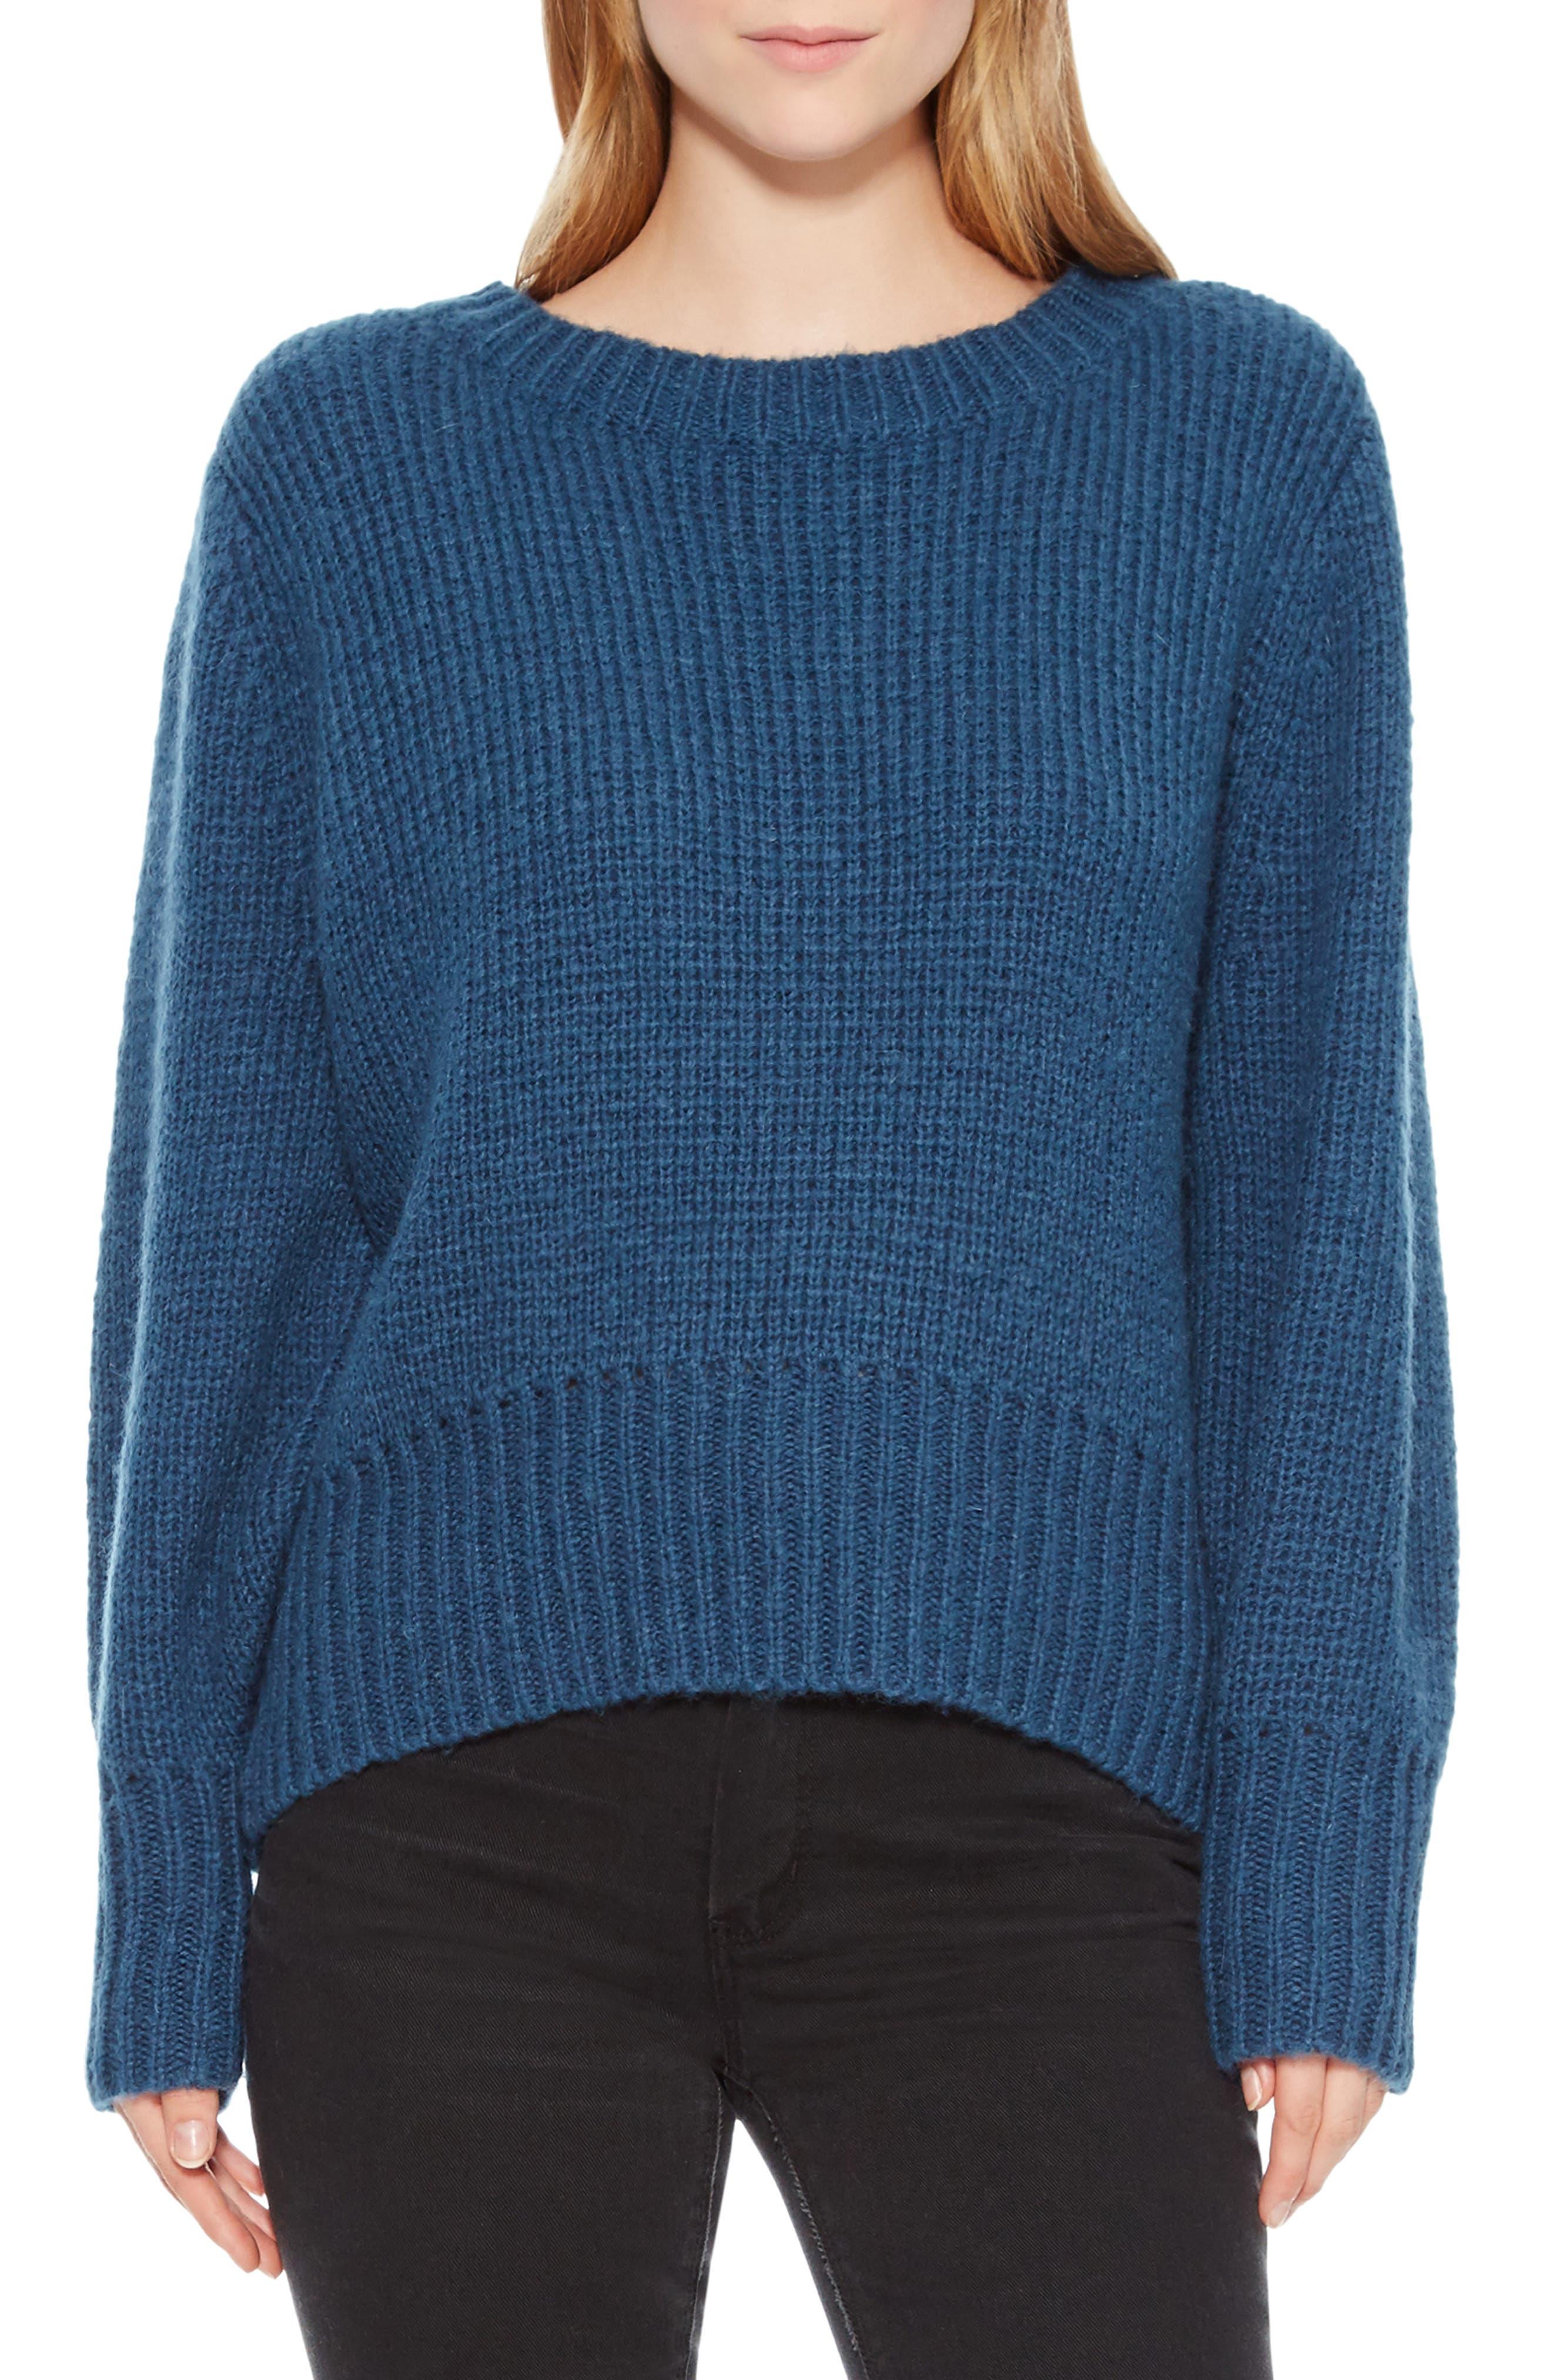 Matty Bow Back Sweater,                             Main thumbnail 1, color,                             449